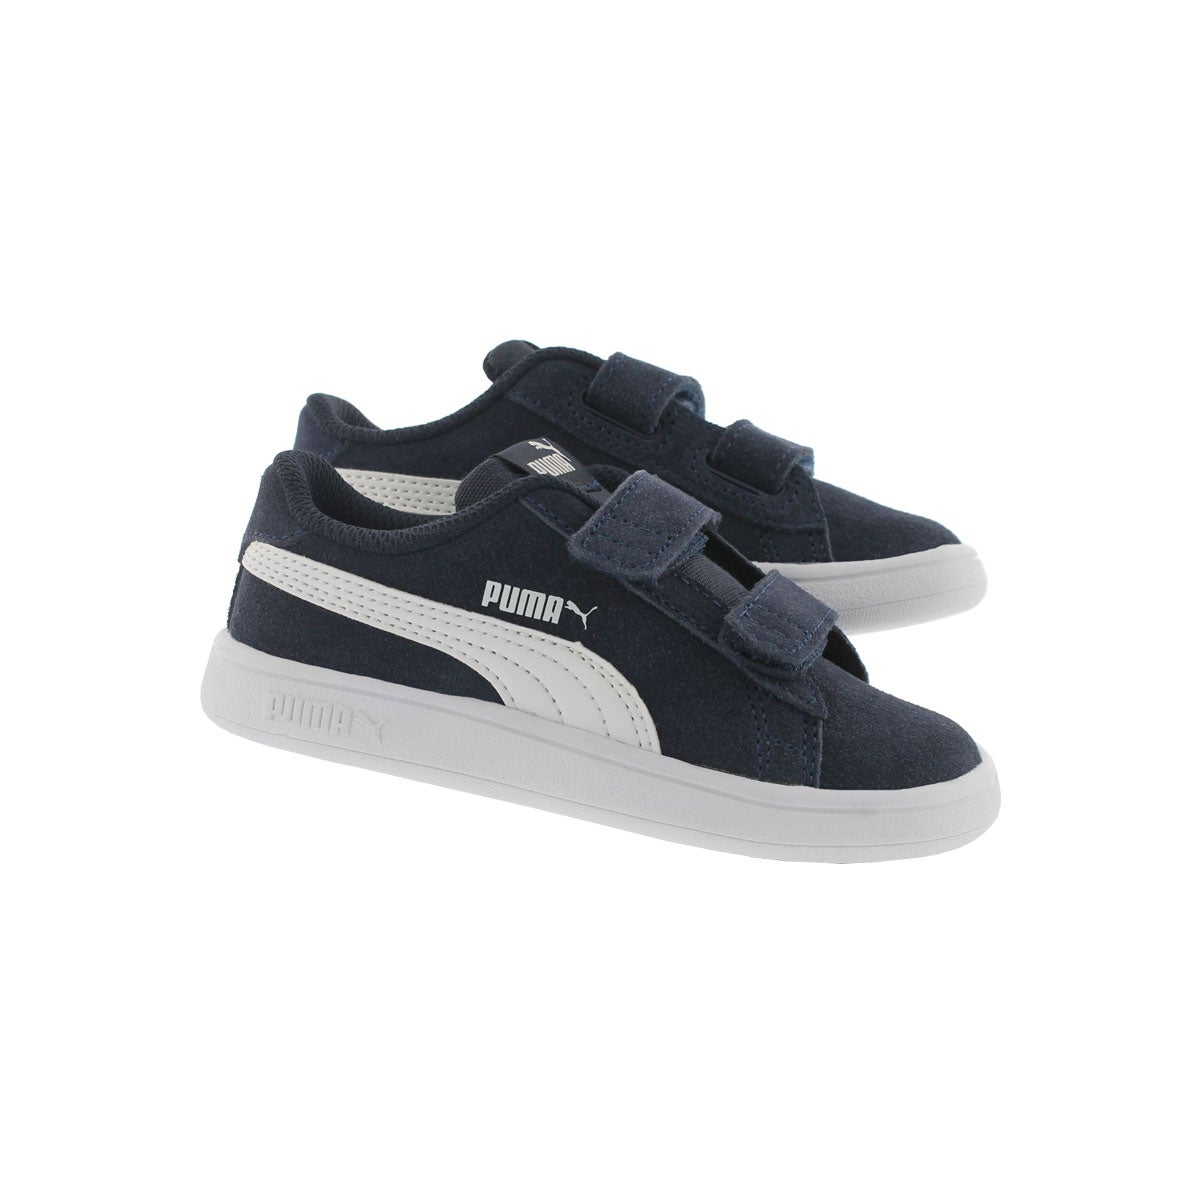 Inf-b Puma Smash v2 peacoat sneaker